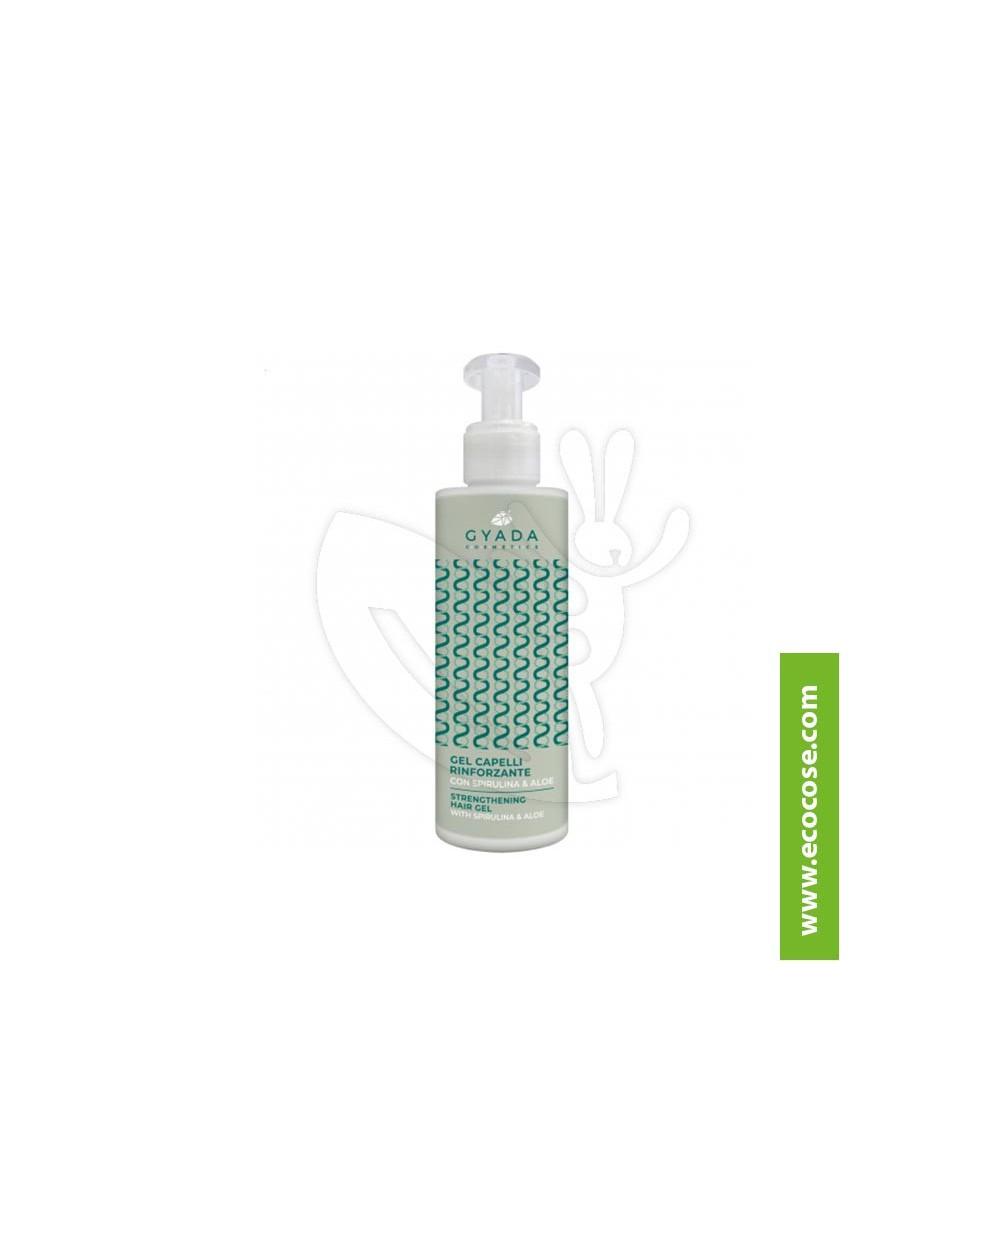 Gyada Cosmetics - Gel capelli rinforzante con spirulina e aloe